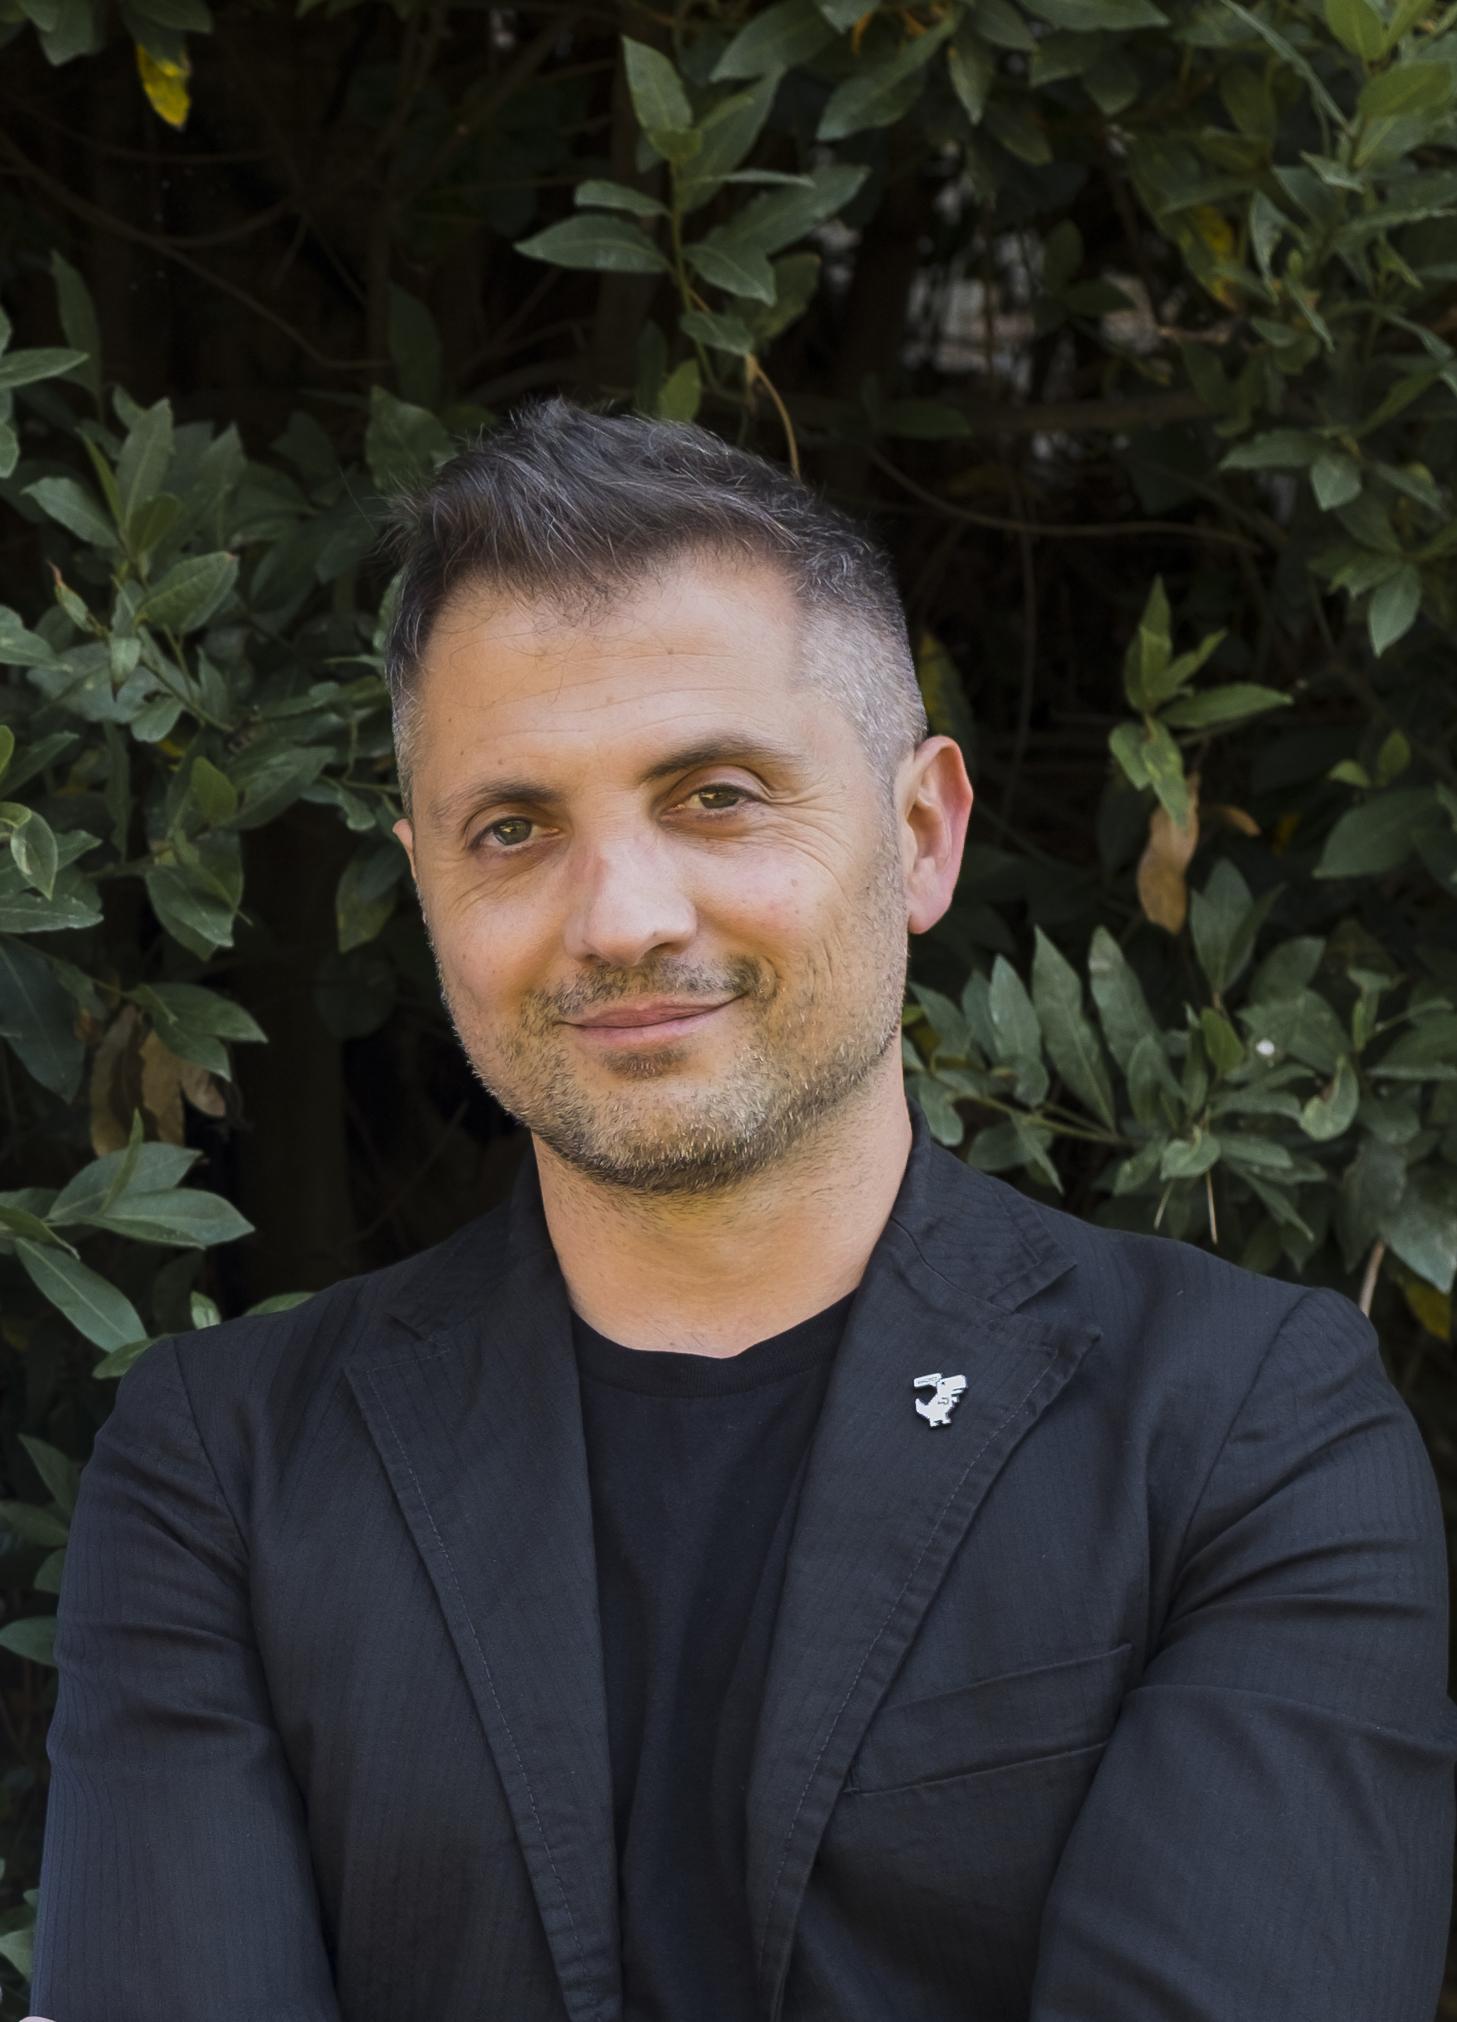 <p>Marco Santomauro</p>